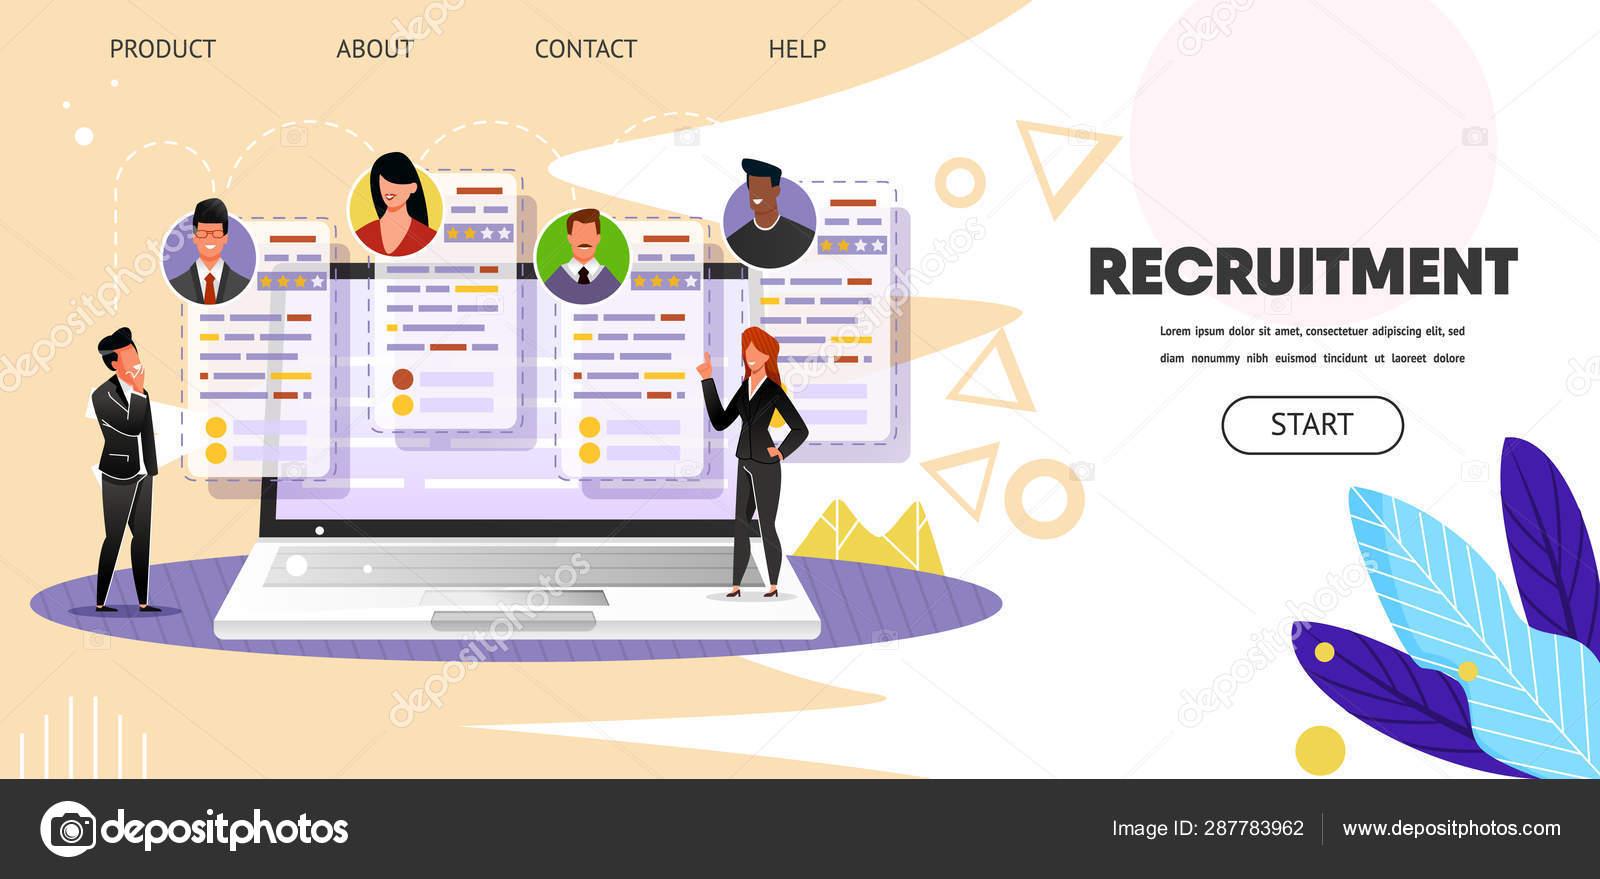 Online Job Search >> Recruitment Online Job Search Web Landing Page Stock